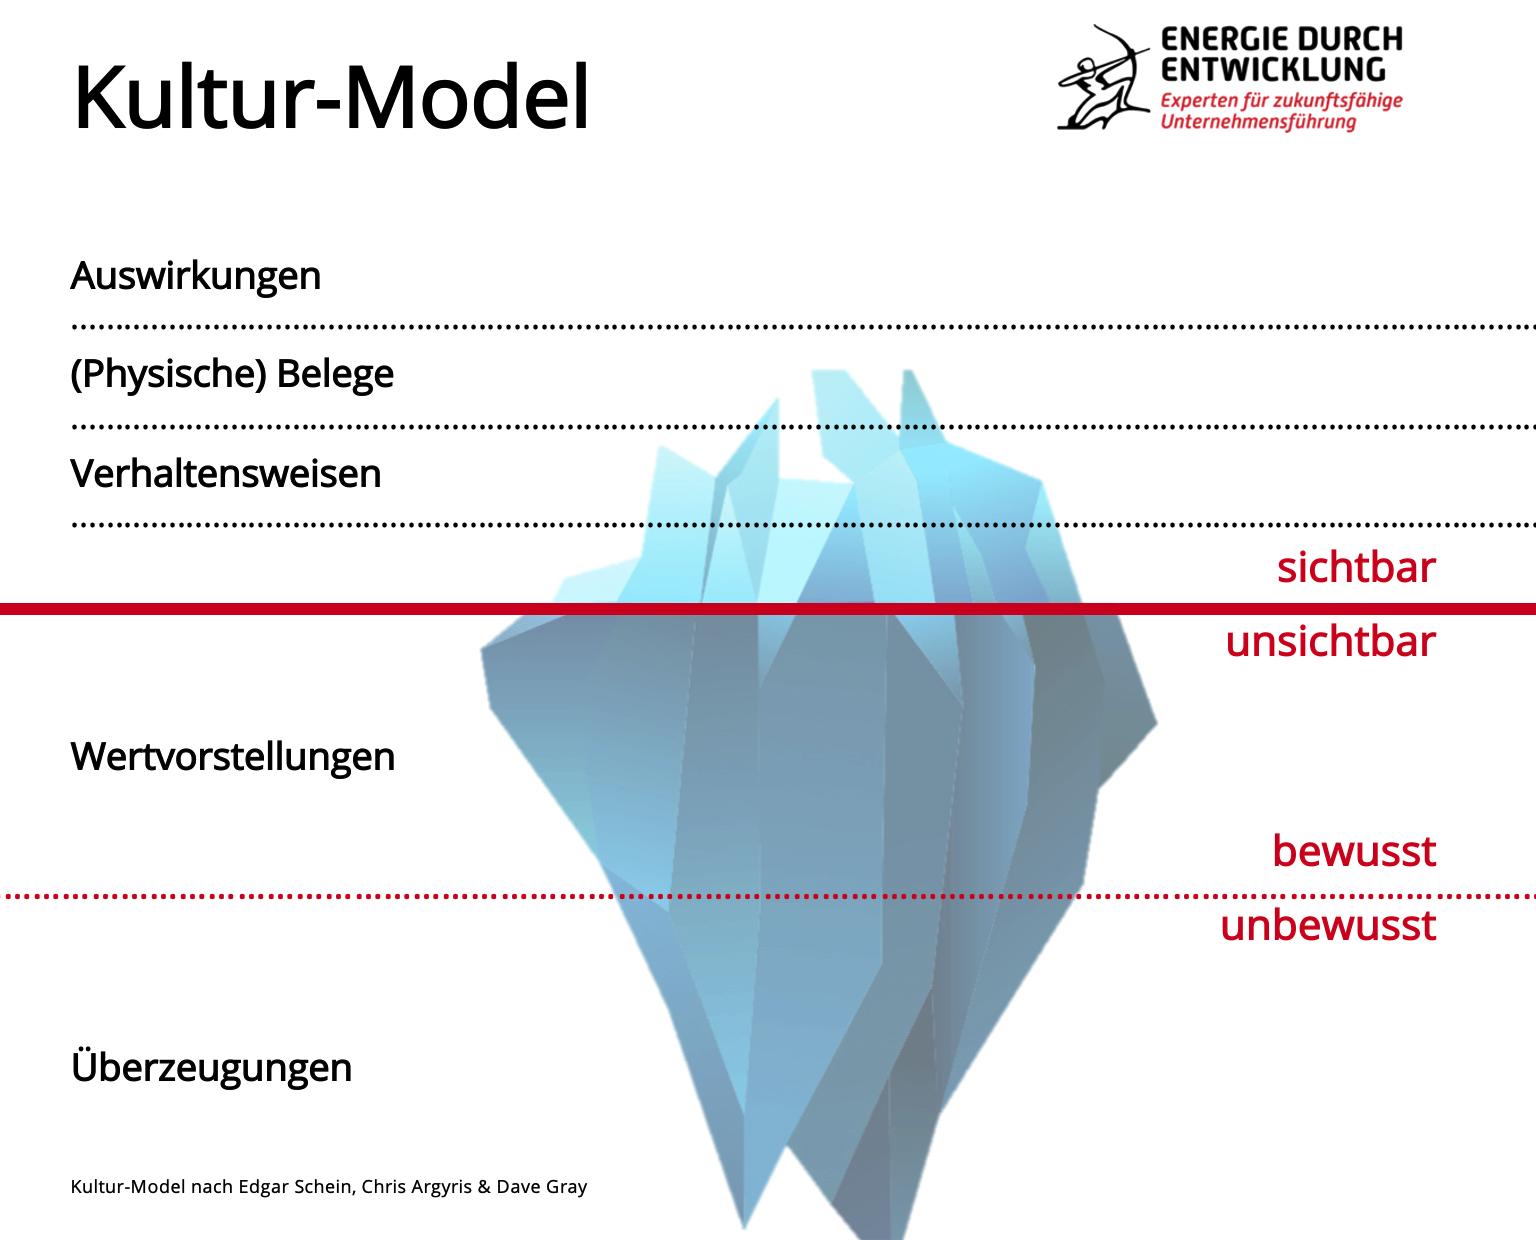 Kulturmodell nach Edgar Schein